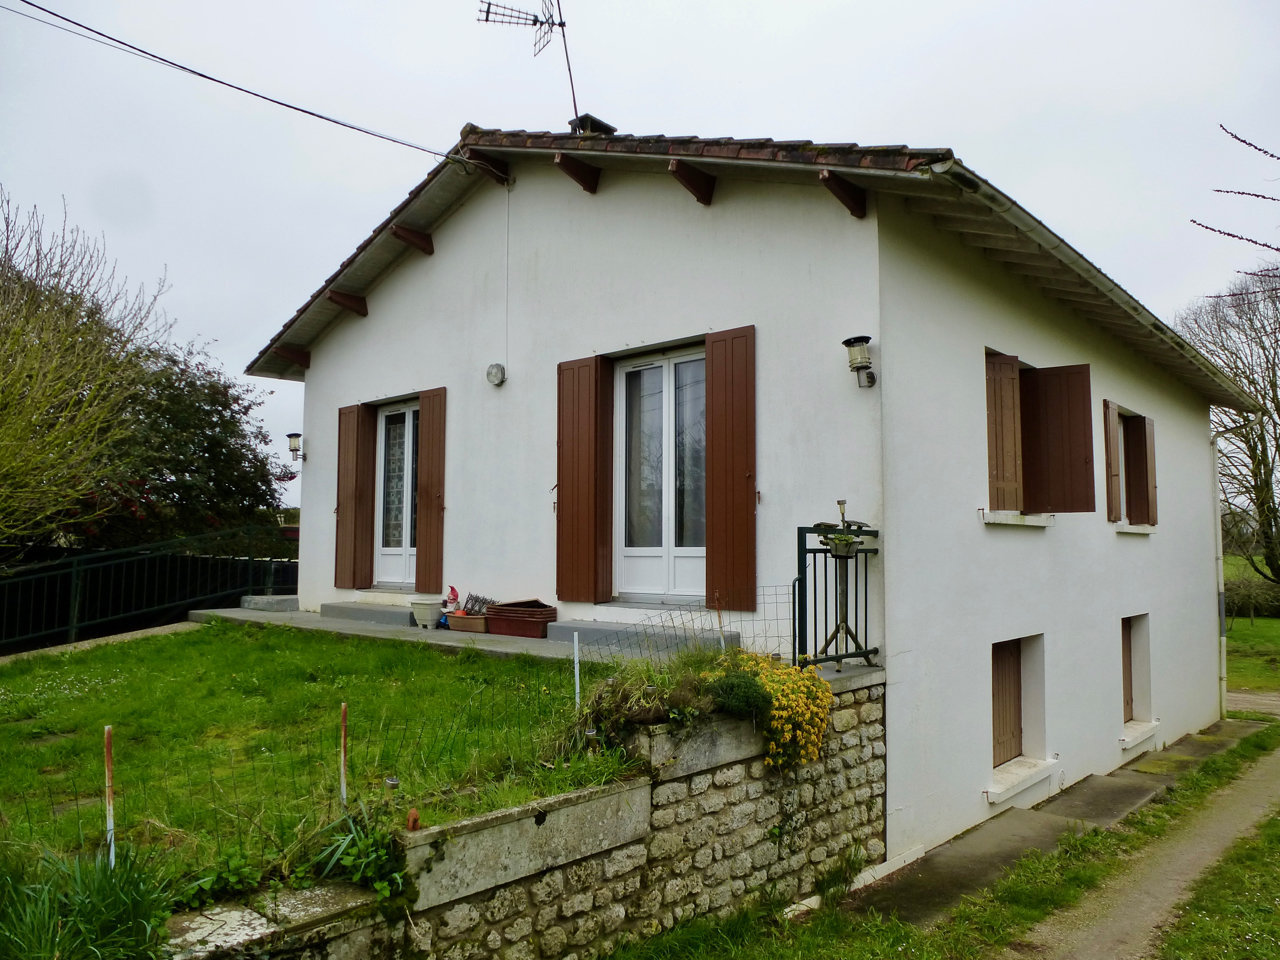 2-bedroom house between Saintes and Royan